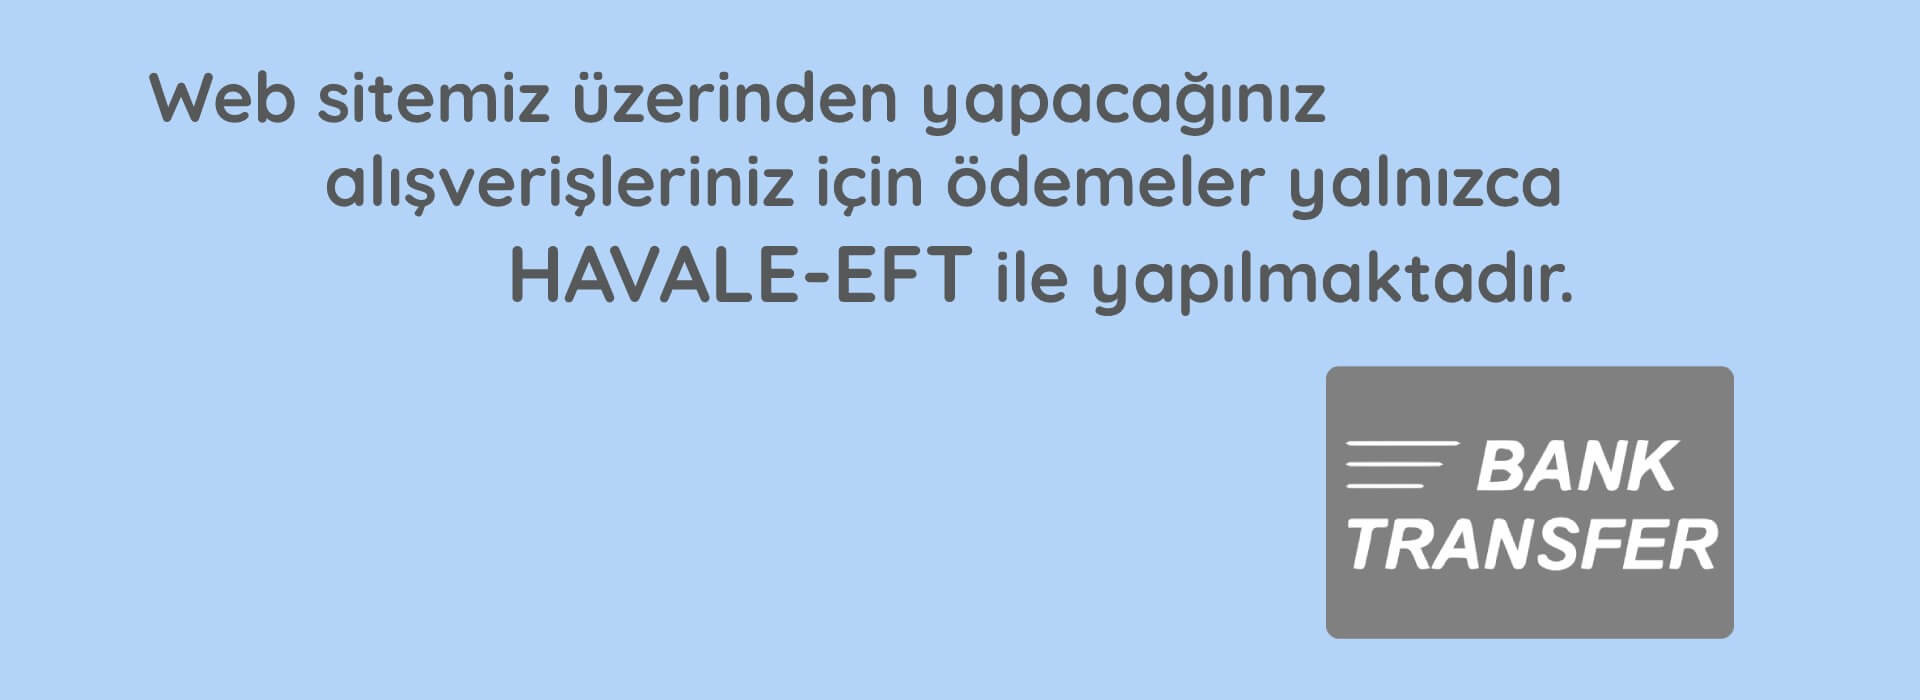 baytardanevinize.com